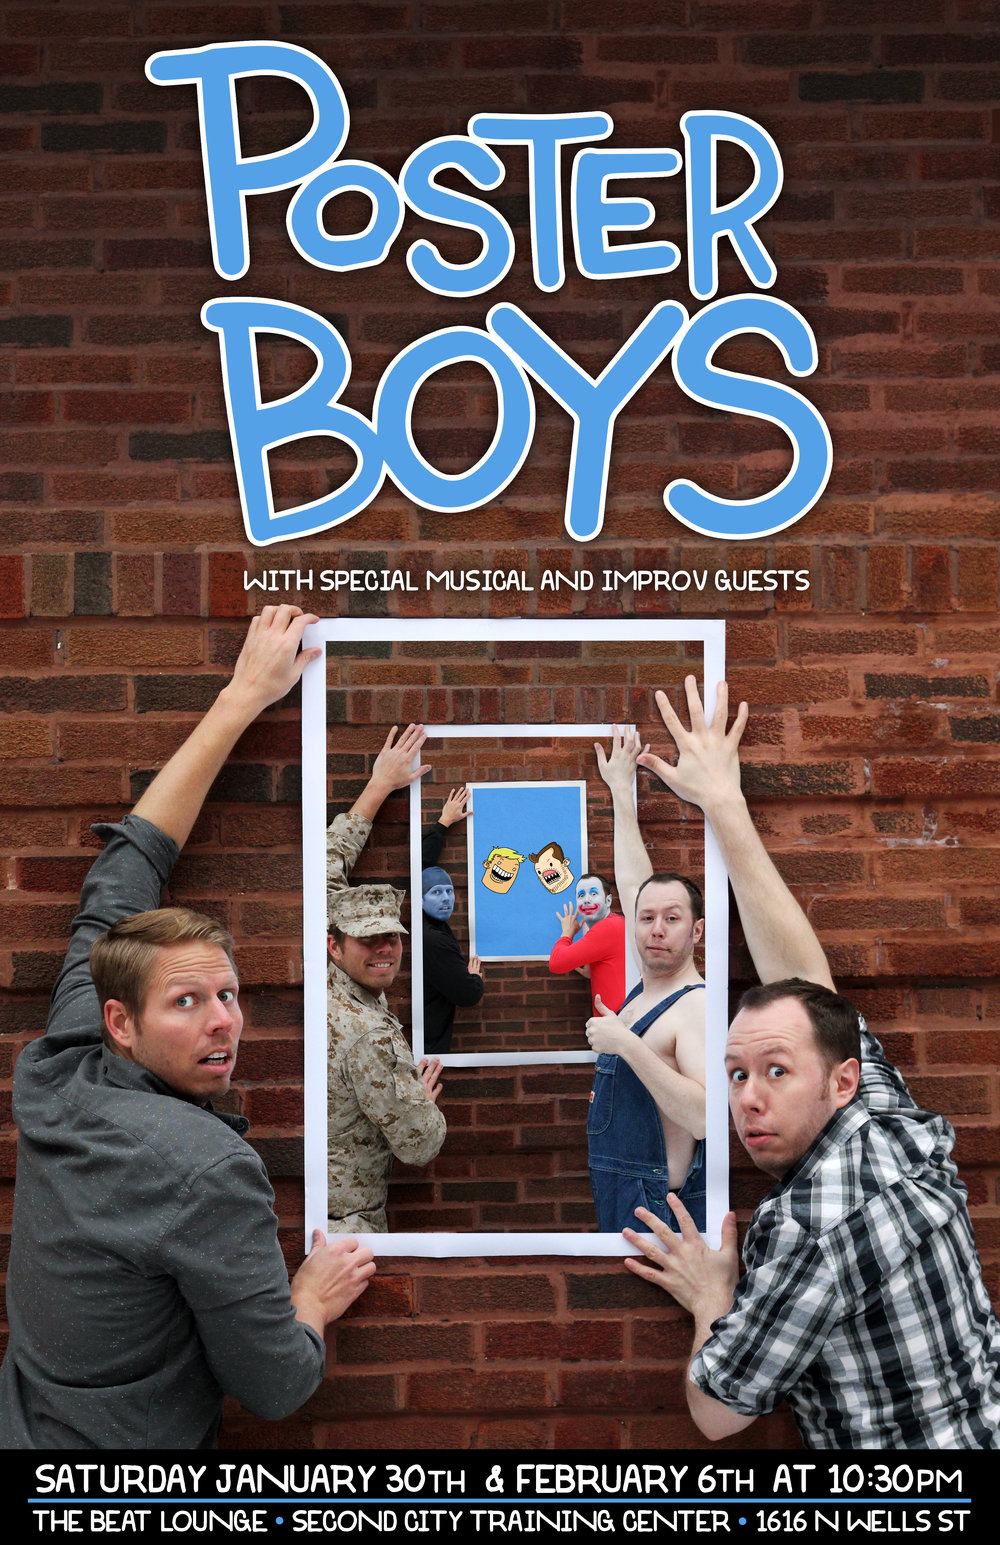 Poster Boys Beat Poster.jpg